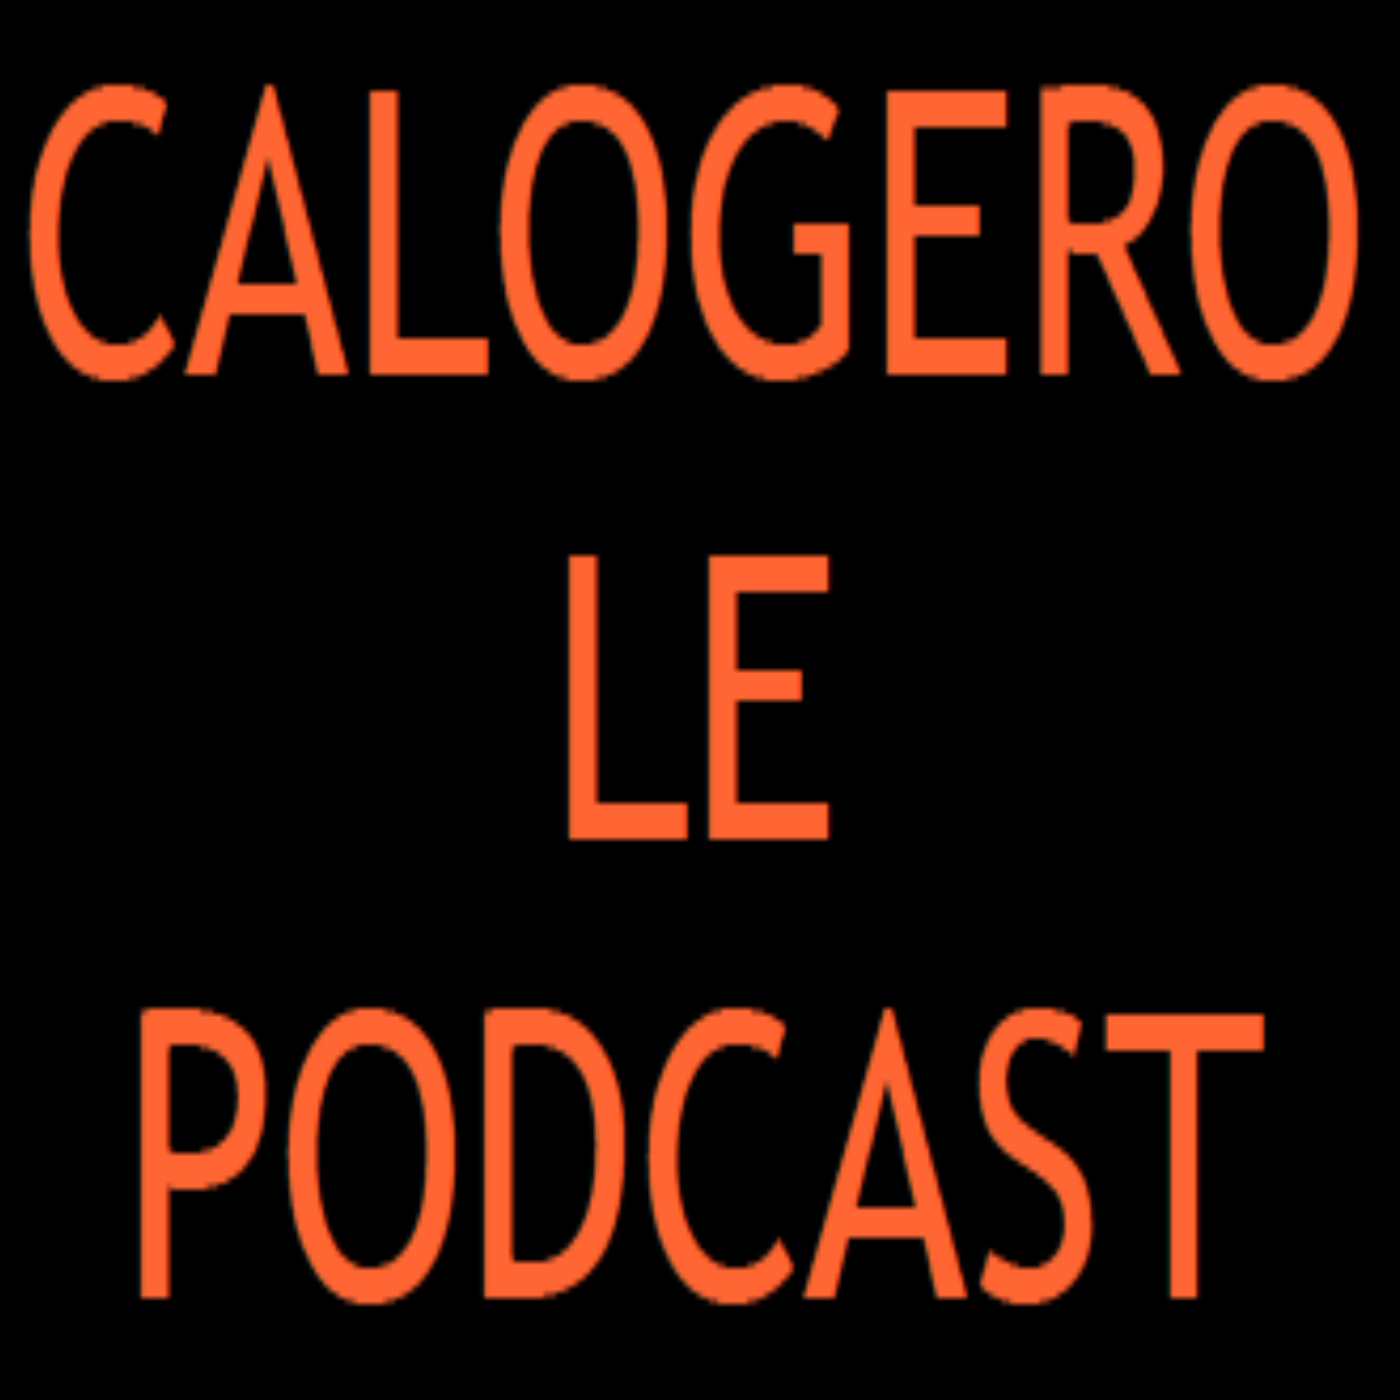 Podcast Episode 16 : Freestyle